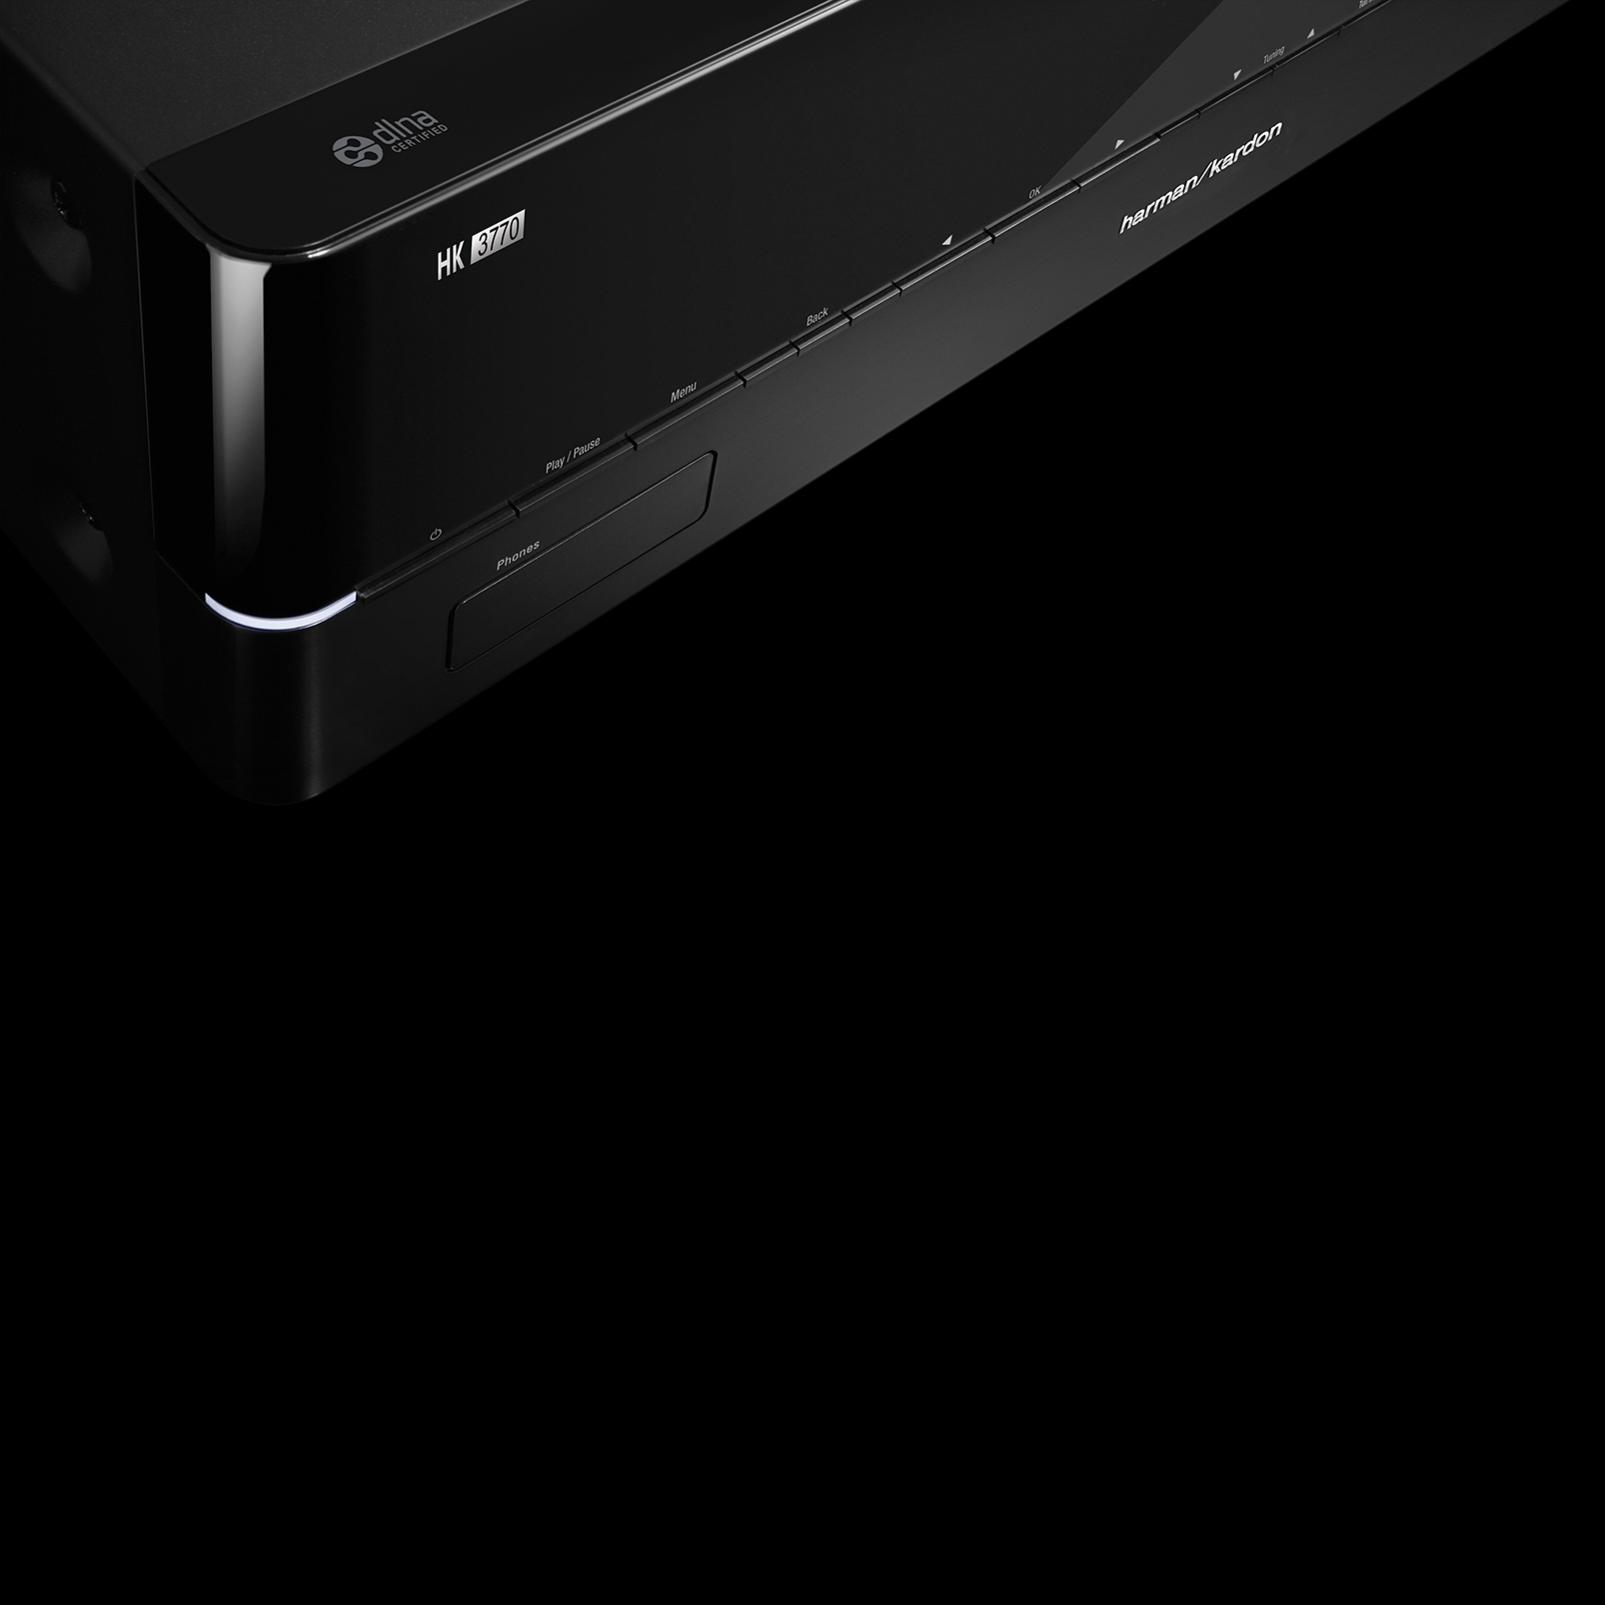 HK 3770 - Black - 240 watt stereo receiver with network connectivity - Detailshot 2